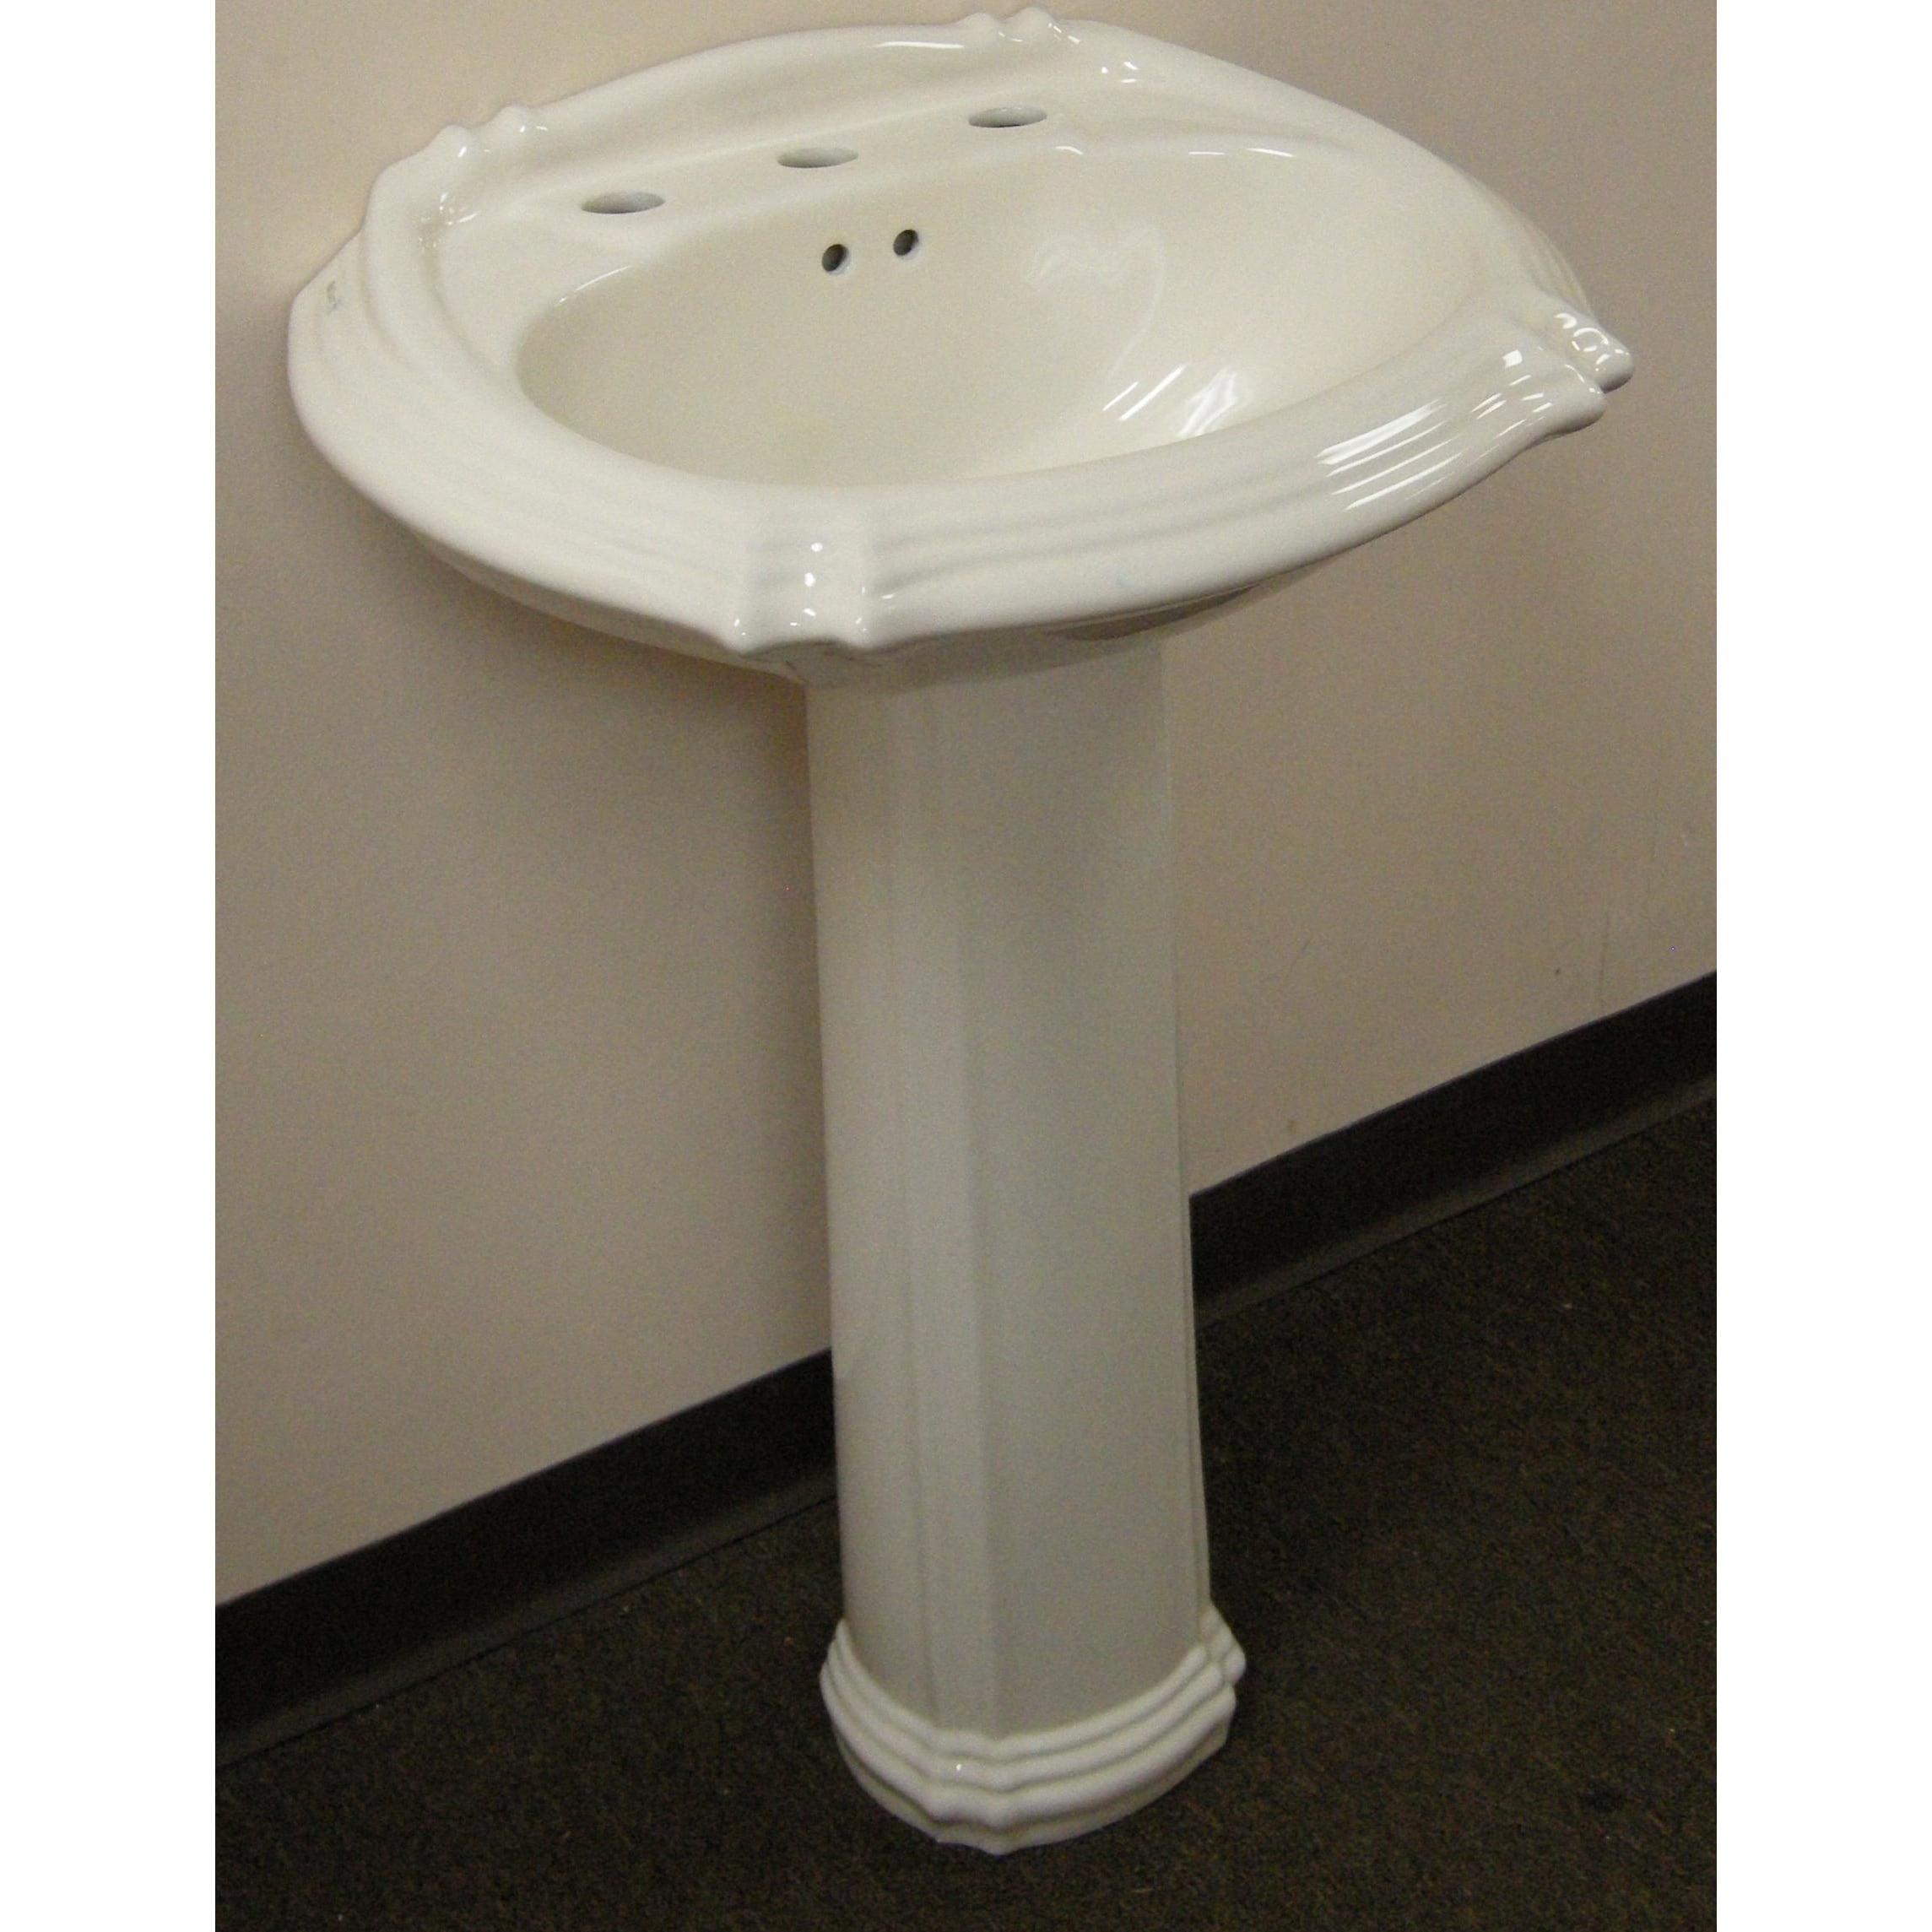 Fine Fixtures Ceramic 22-inch Biscuit Pedestal Sink (Cera...